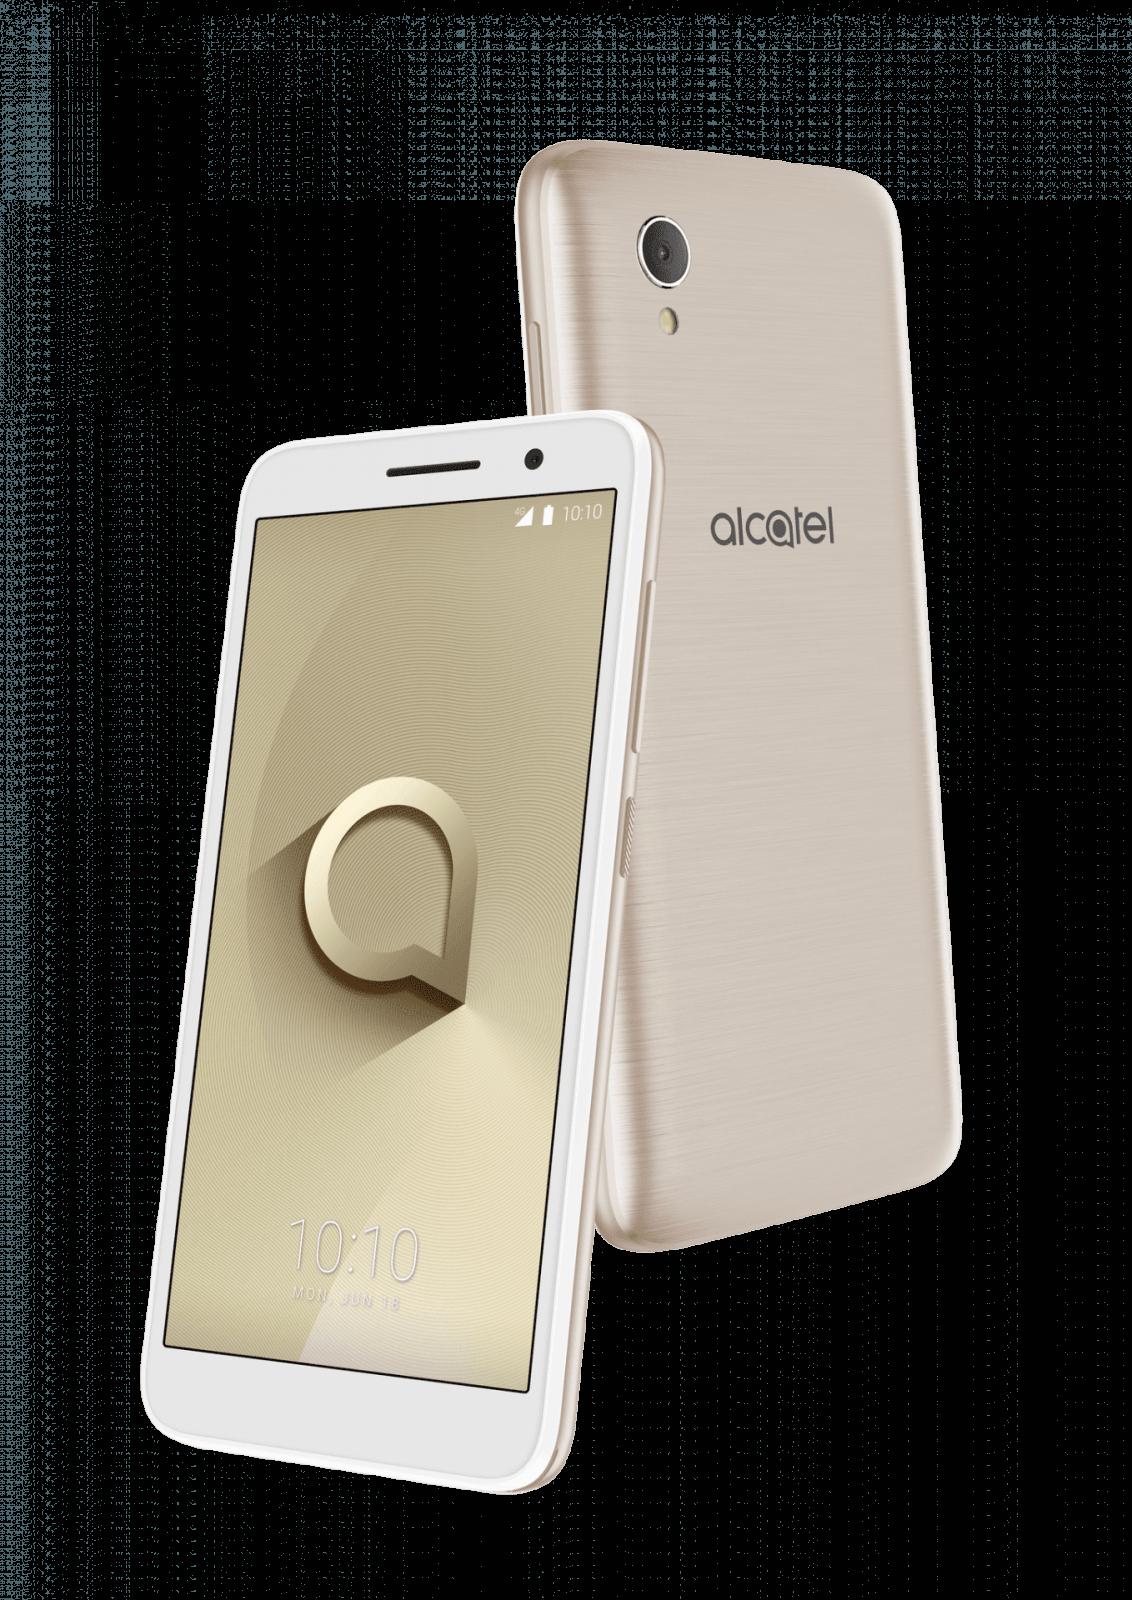 Alcatel выпустил смартфон Alcatel 1 на Android Go (jK3HFlaC)